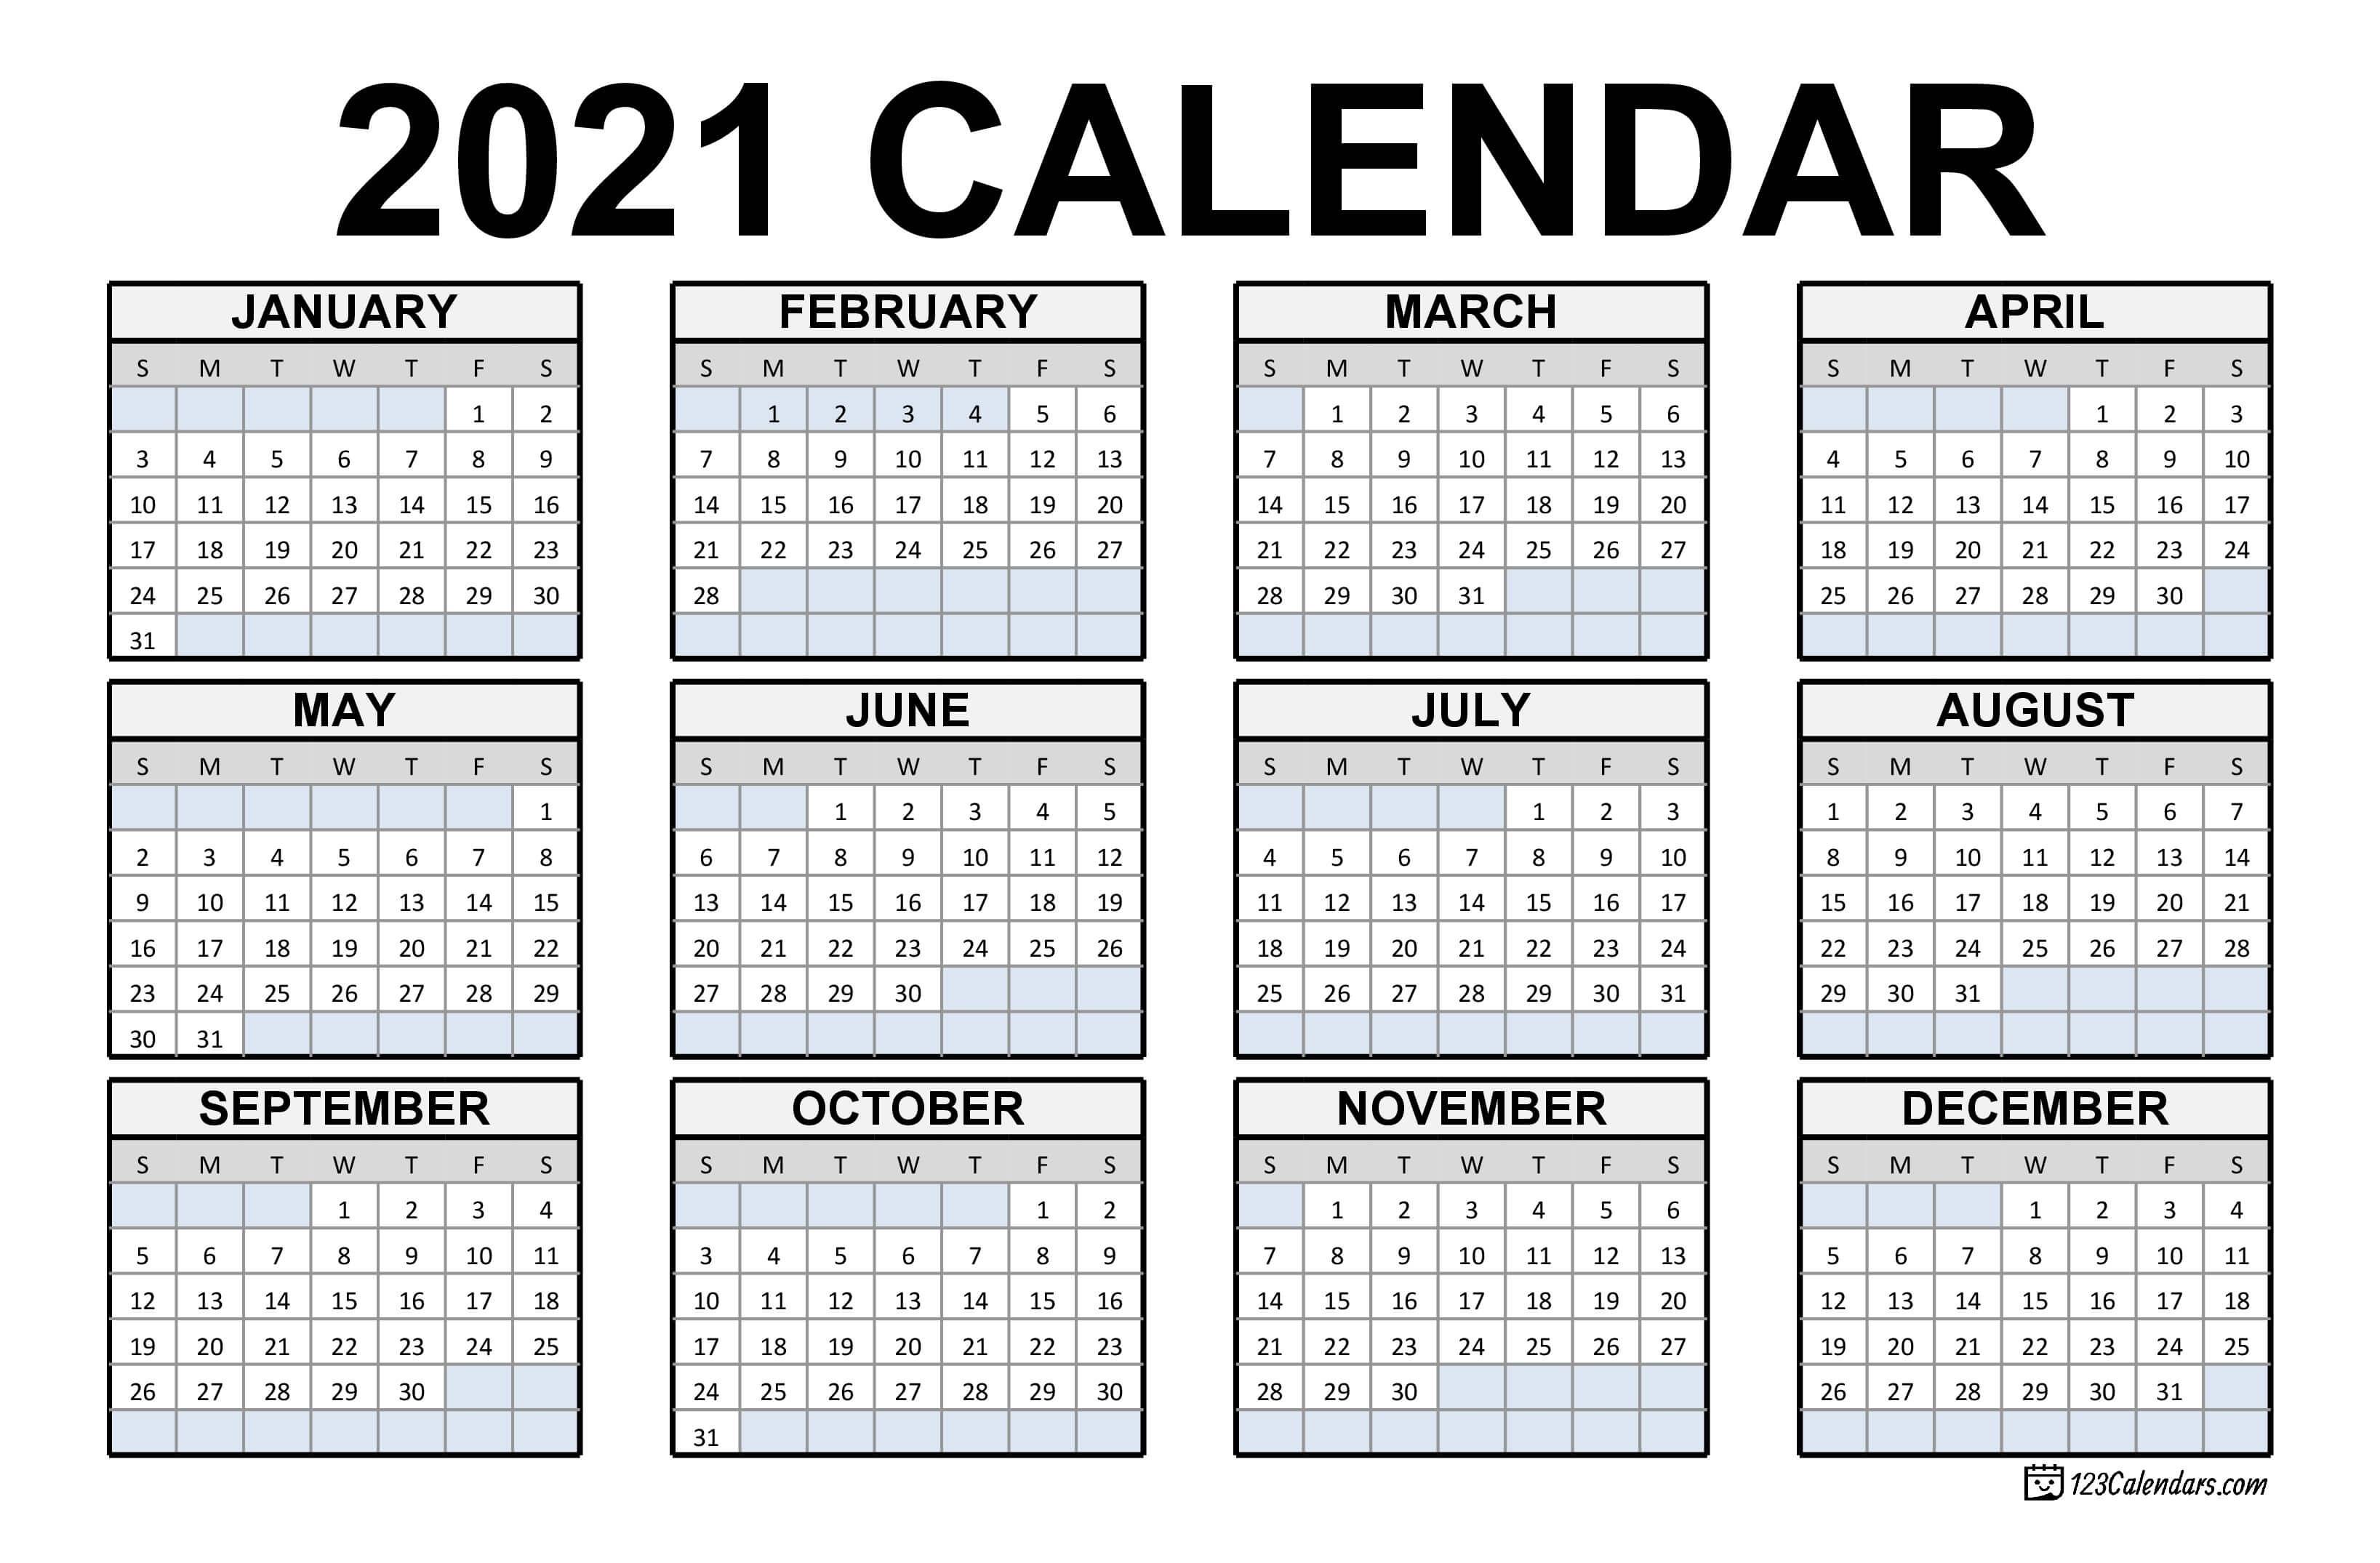 2021 Printable Calendar | 123Calendars Print Ready Calendar Template